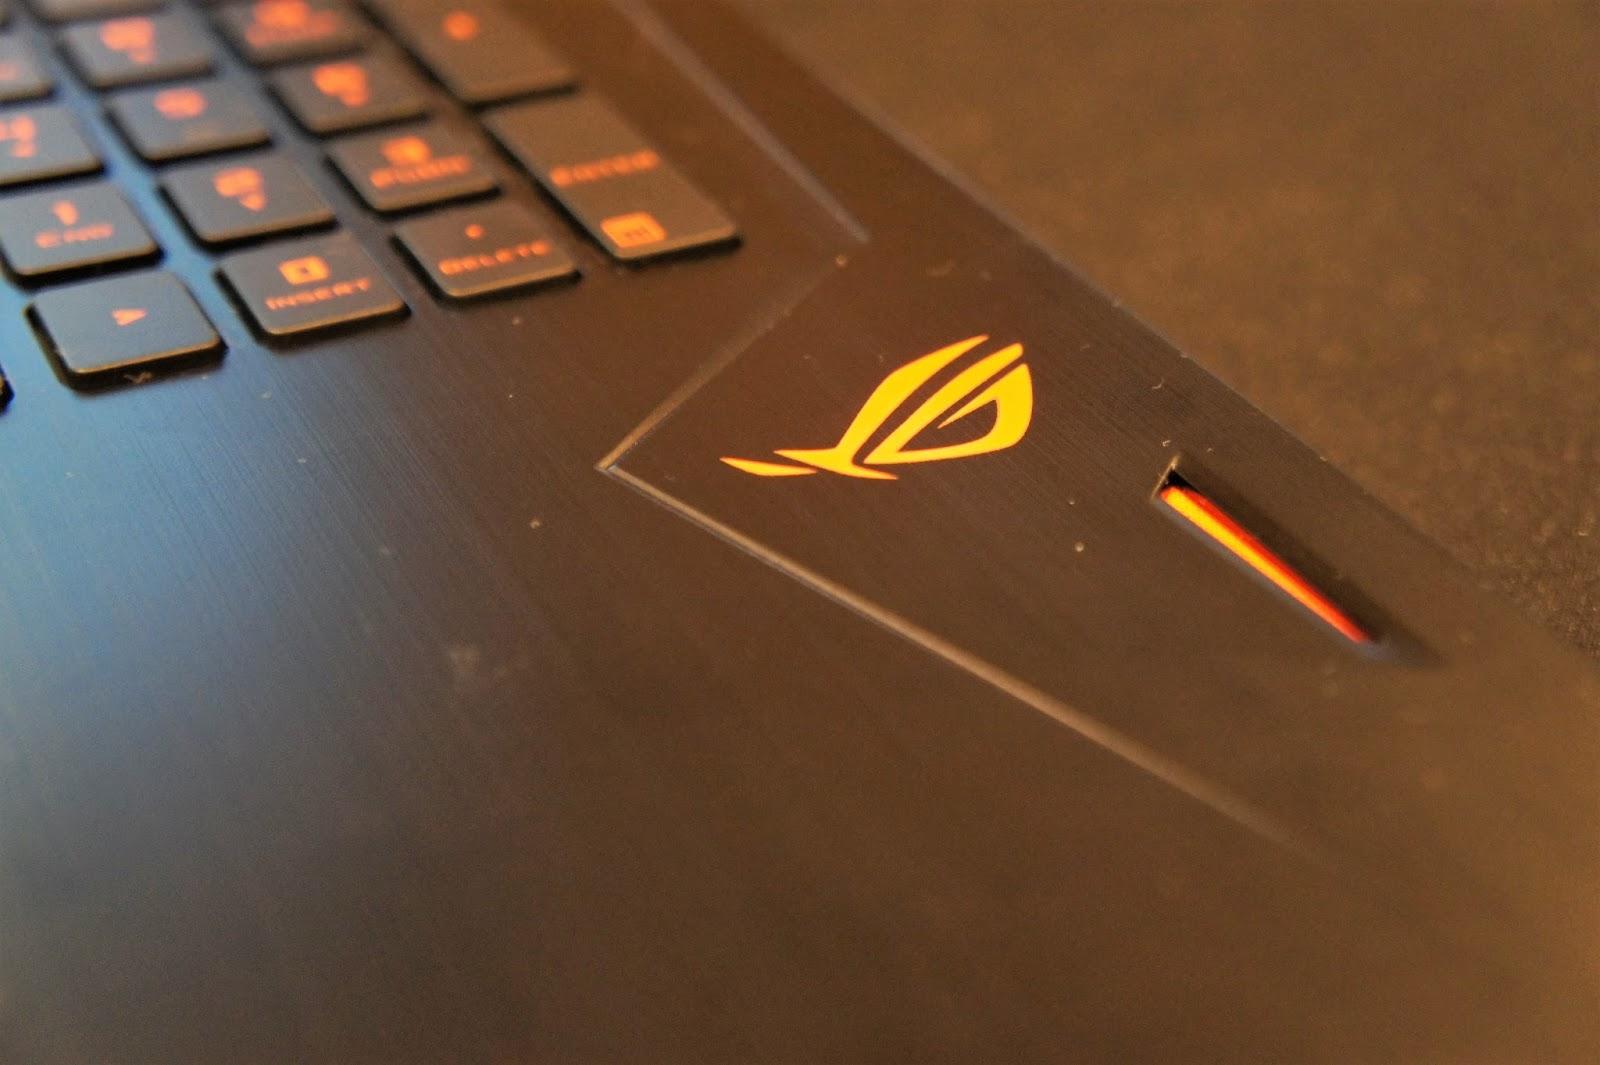 ASUS ROG STRIX GL502 Gaming Laptop with GTX 1070